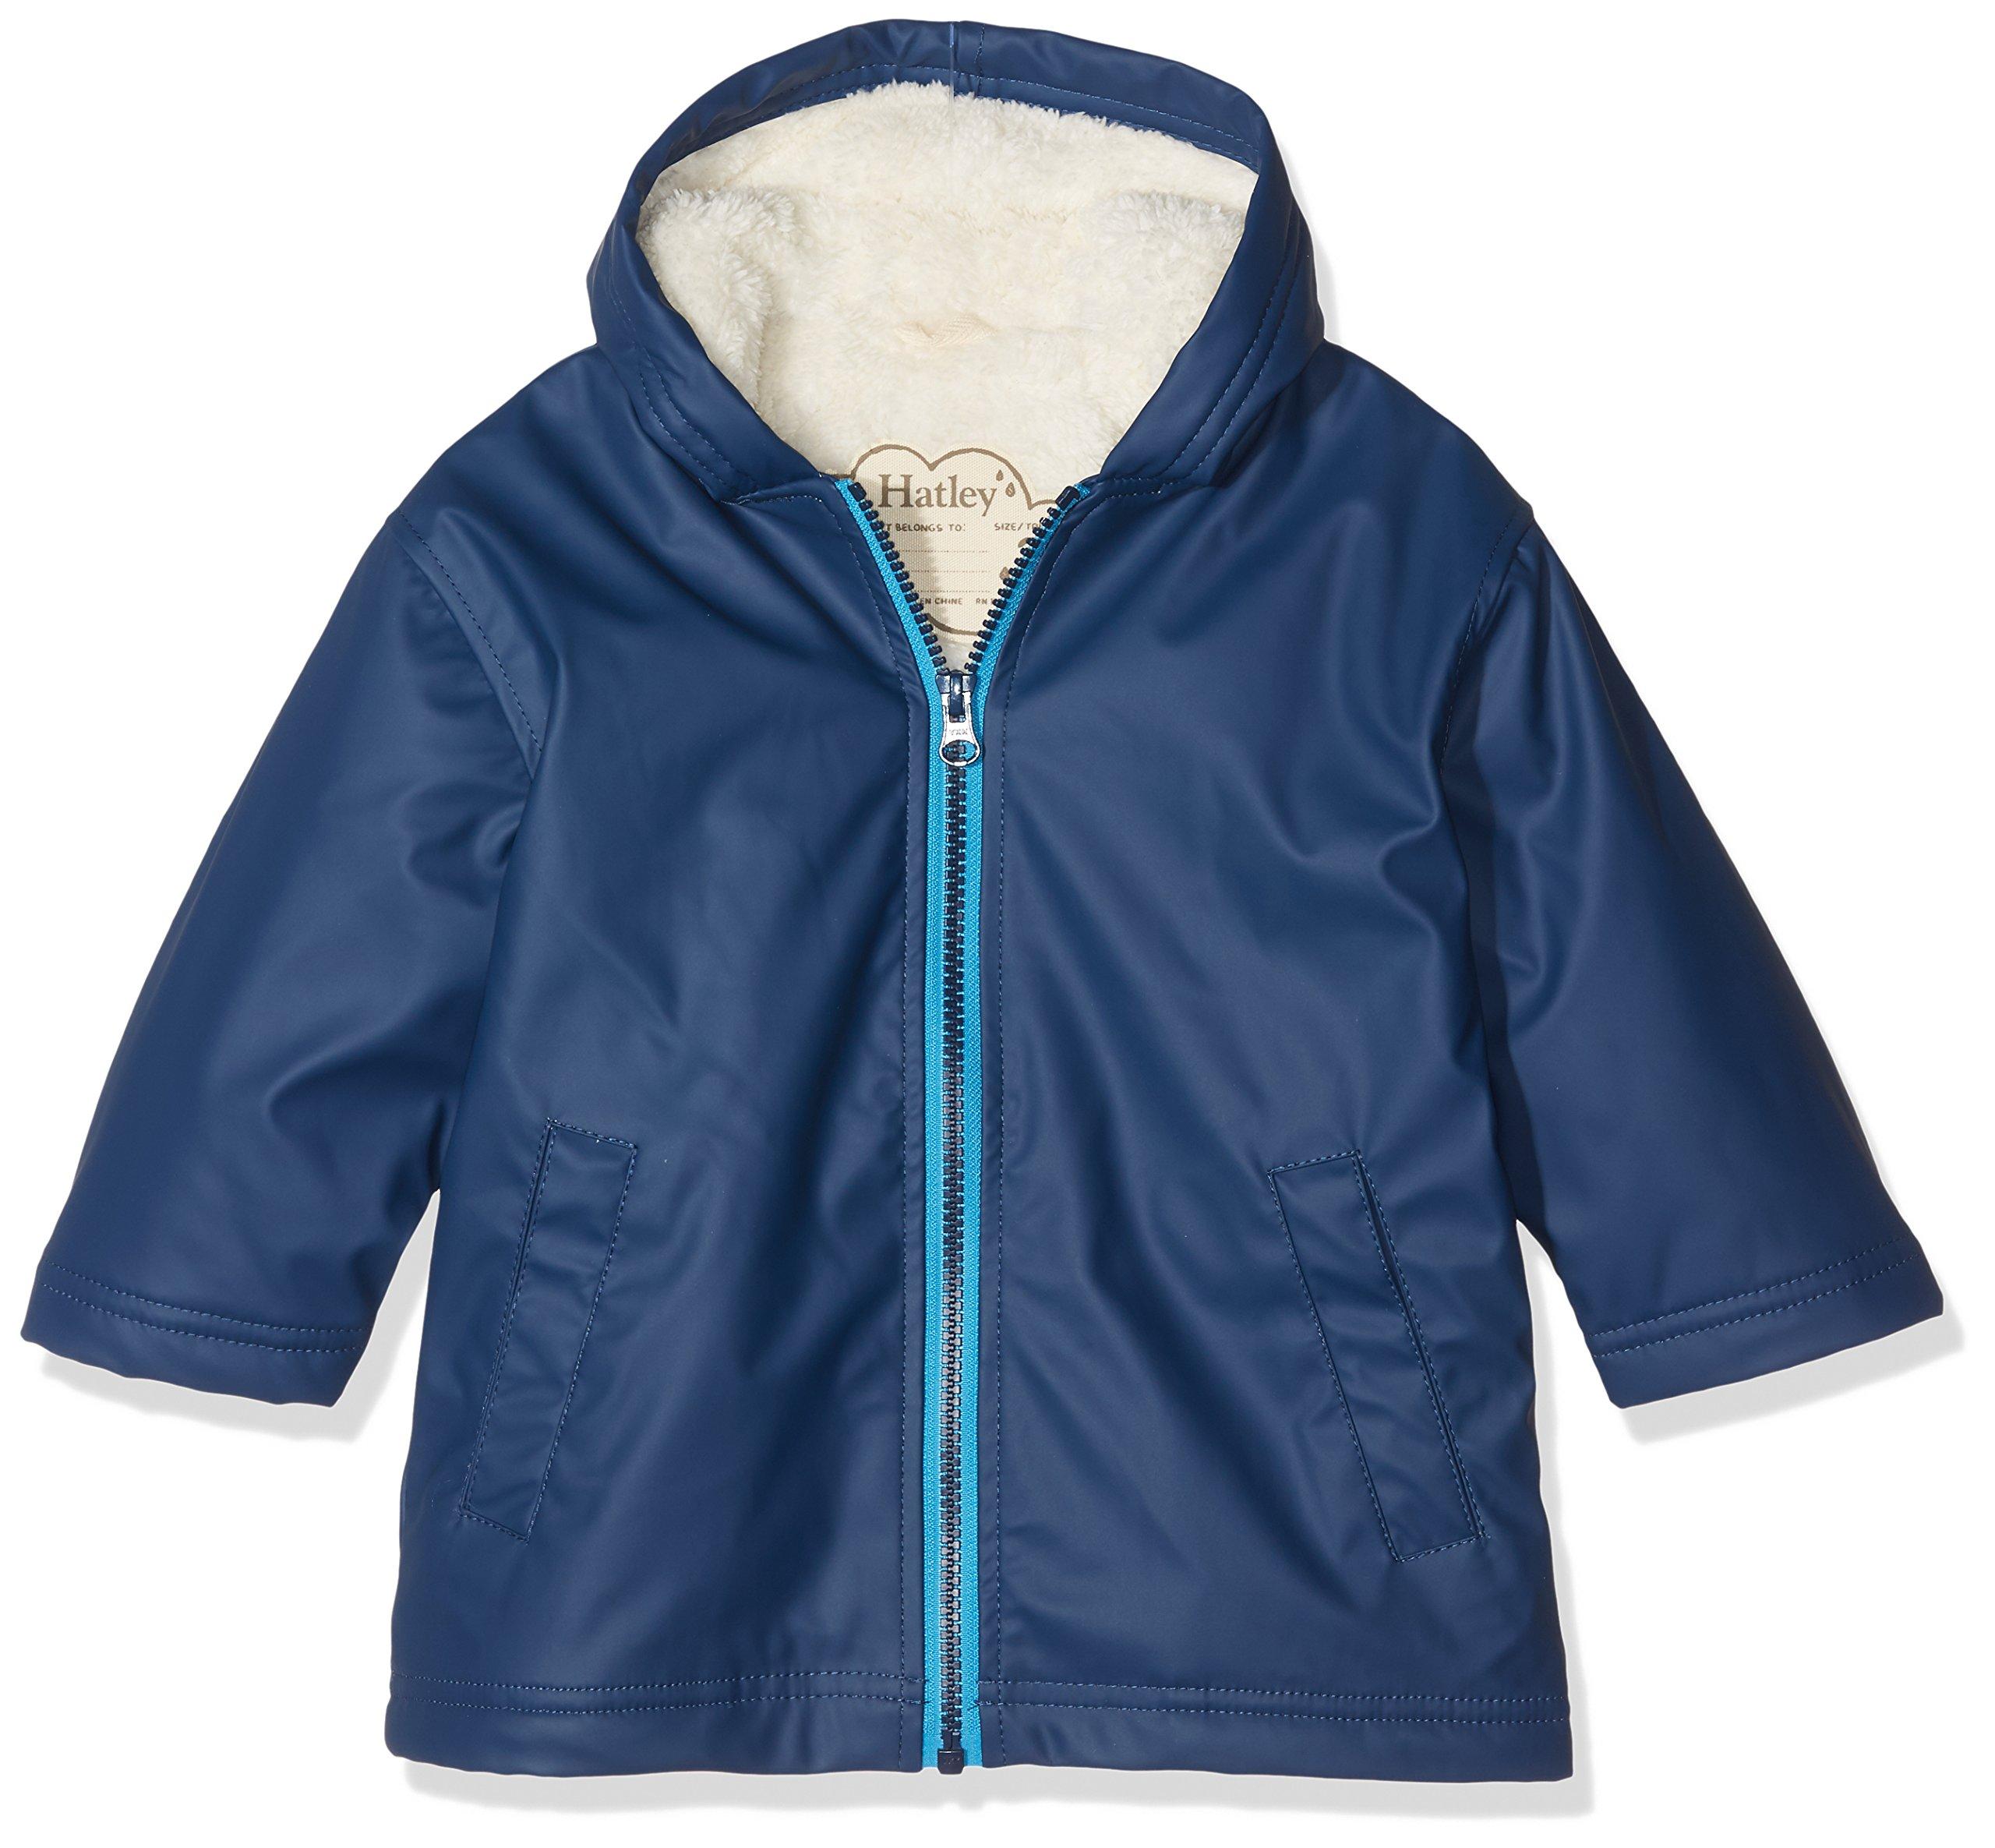 Hatley Big Boys' Splash Jacket, Classic Navy, 7